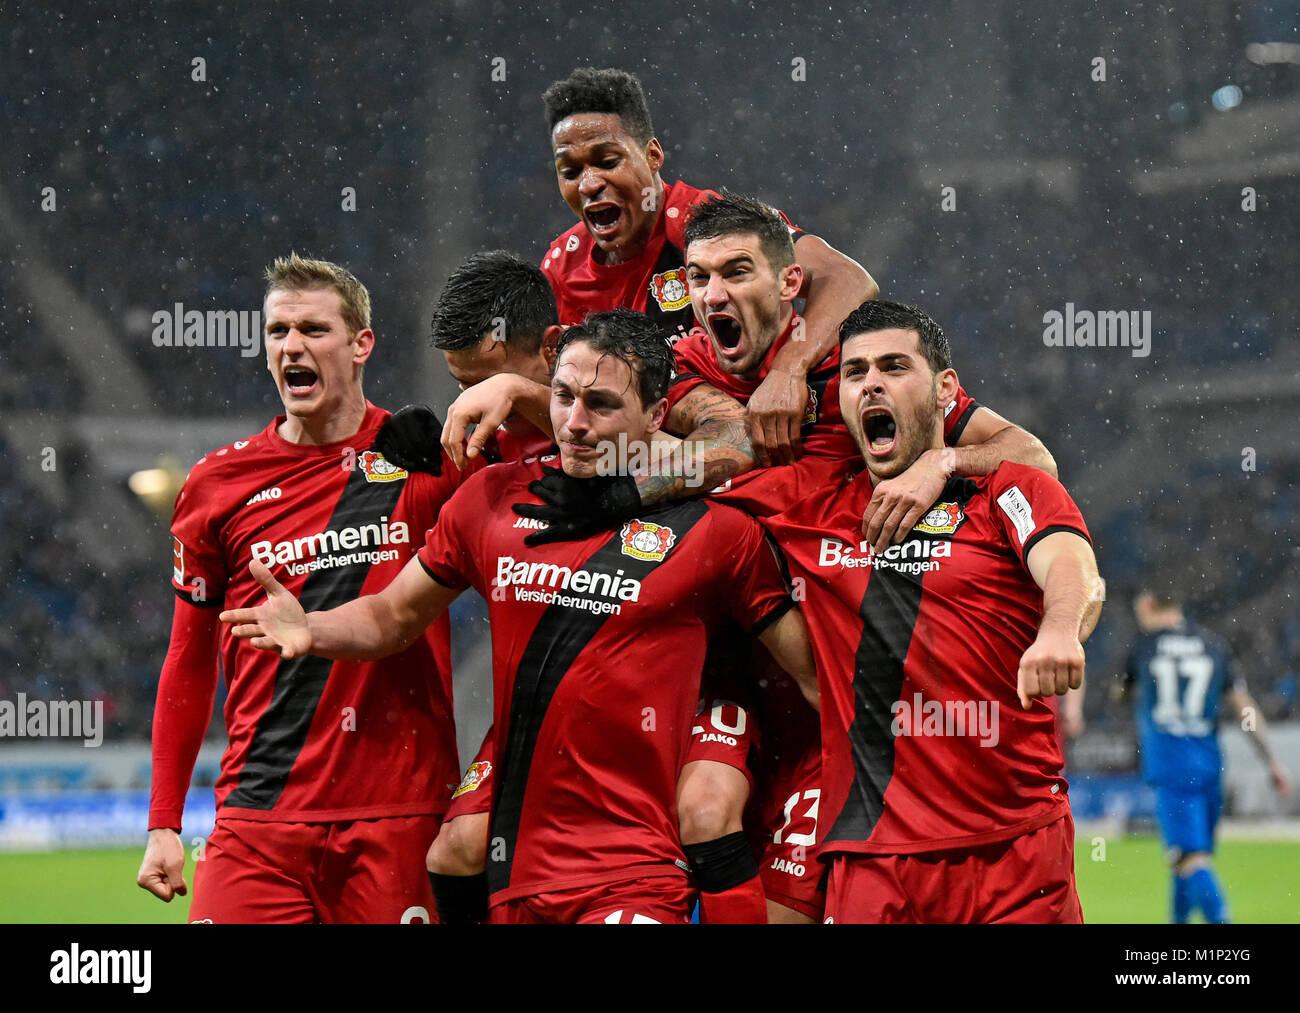 Goal celebration by soccer players of Bayer Leverkusen,Wirsol Rhein-Neckar Arena,Hoffenheim,Baden-Württemberg,Germany - Stock Image